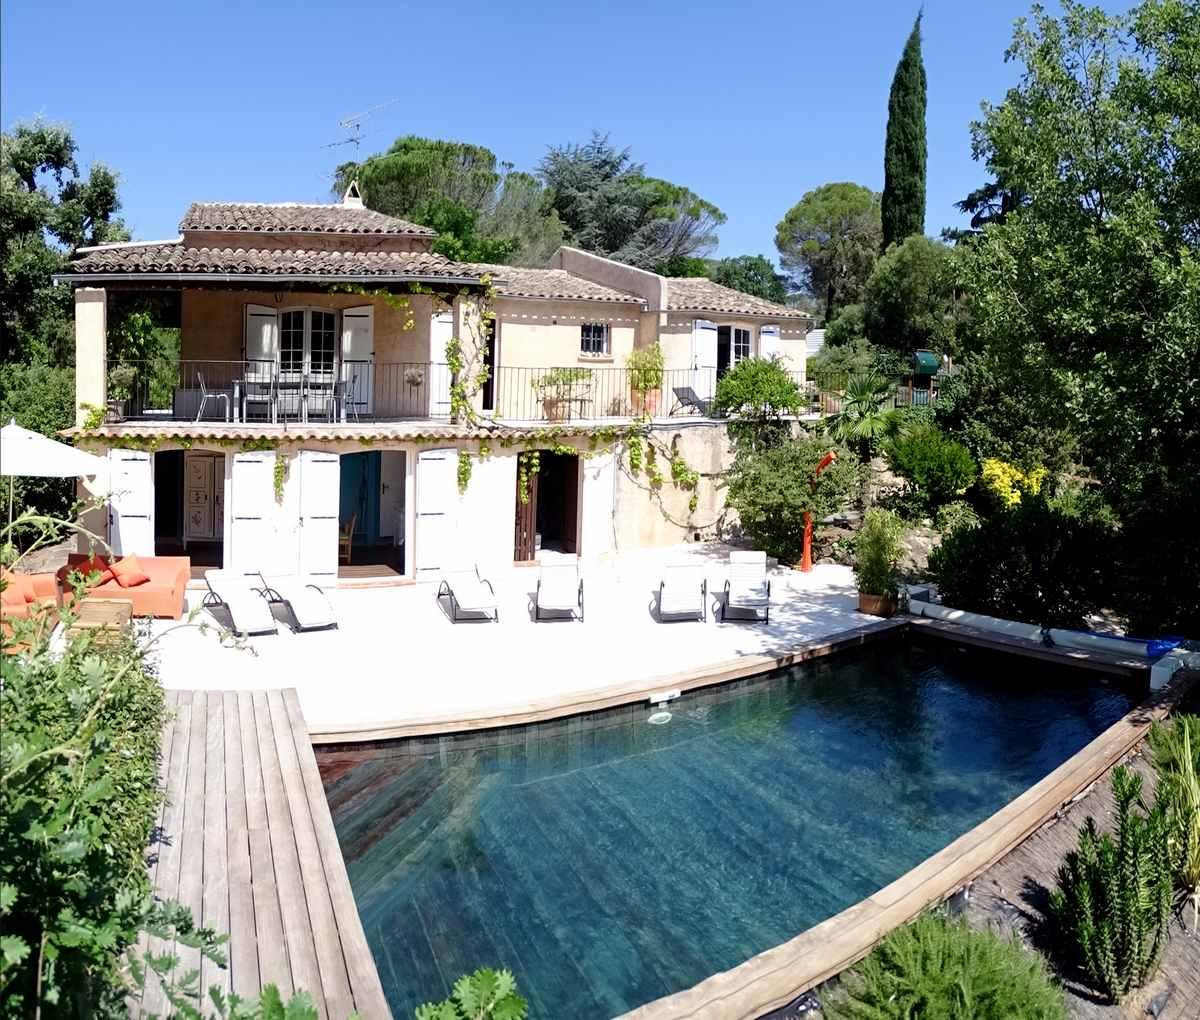 french holiday rental var french holiday rentals cote d 39 azur south france. Black Bedroom Furniture Sets. Home Design Ideas